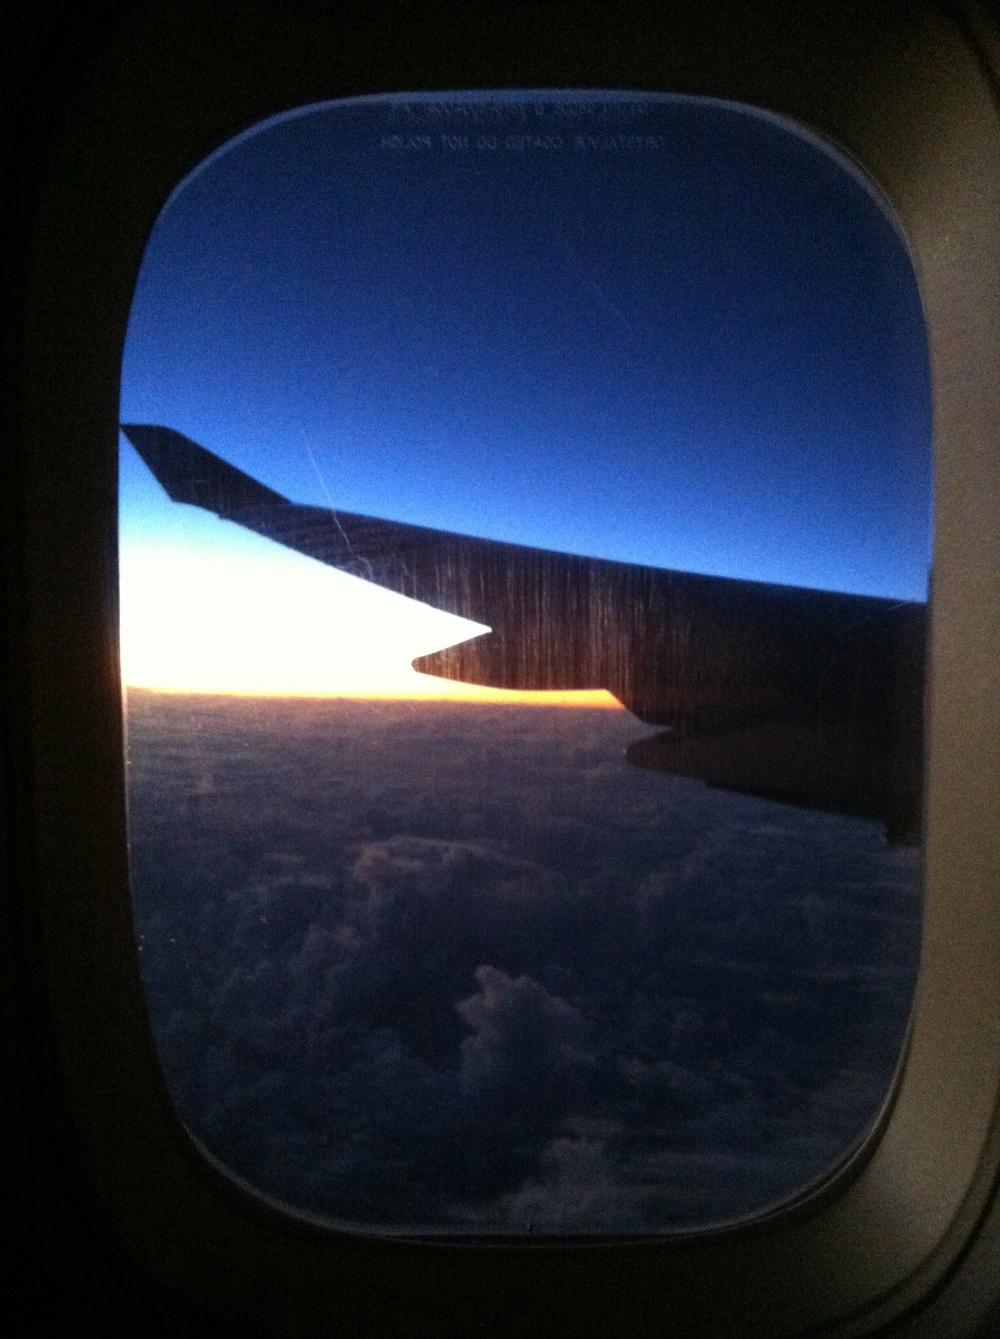 Sunrise in the Southern Hemisphere